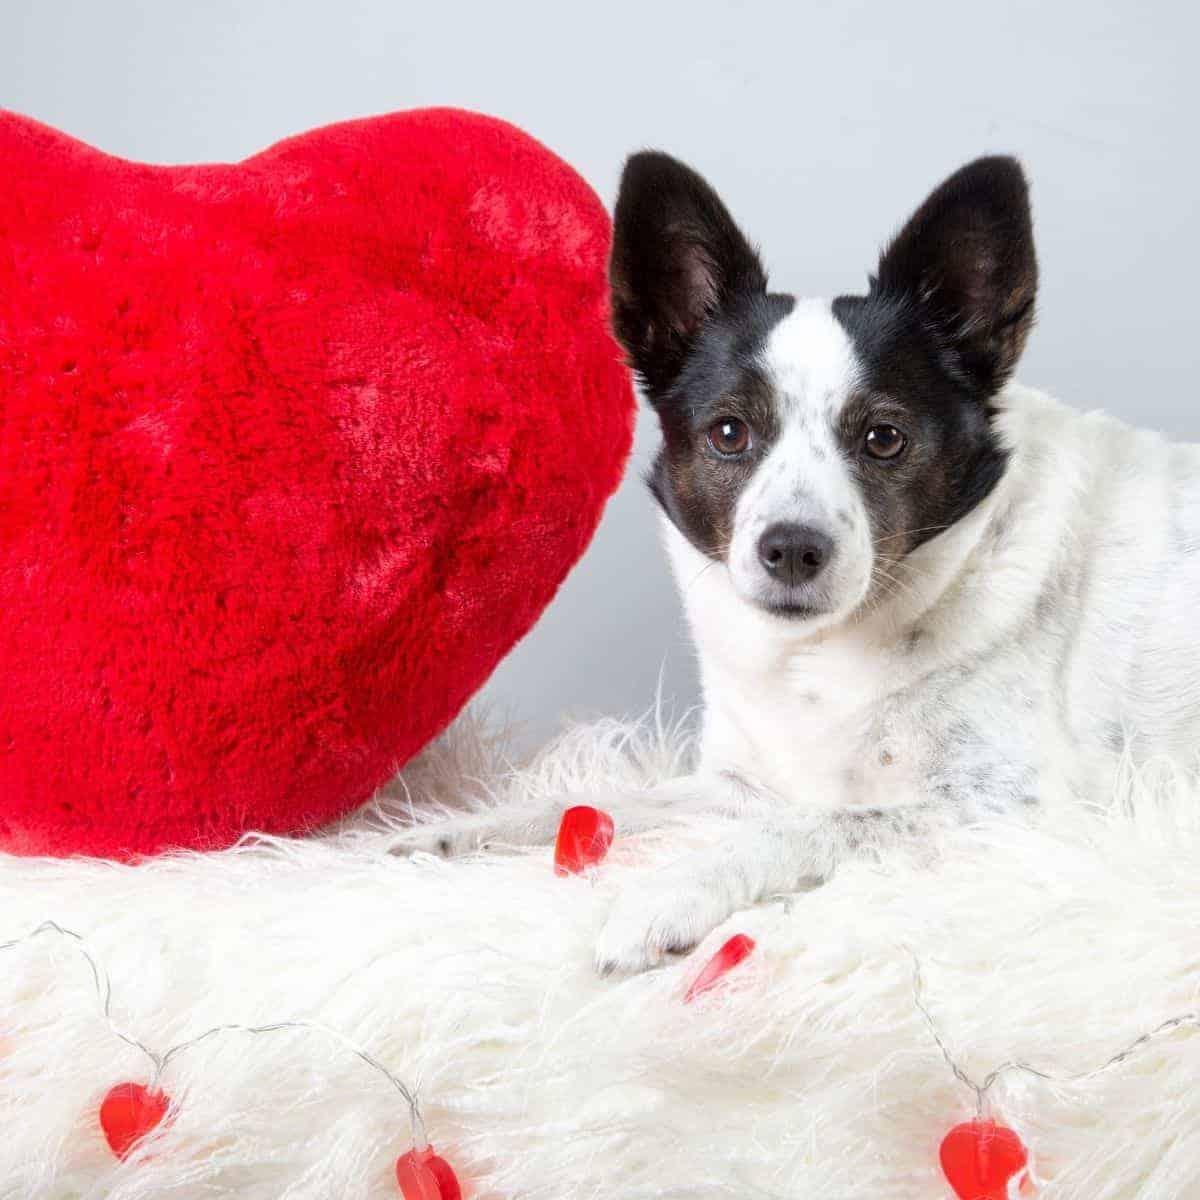 Dog's Valentine's Day